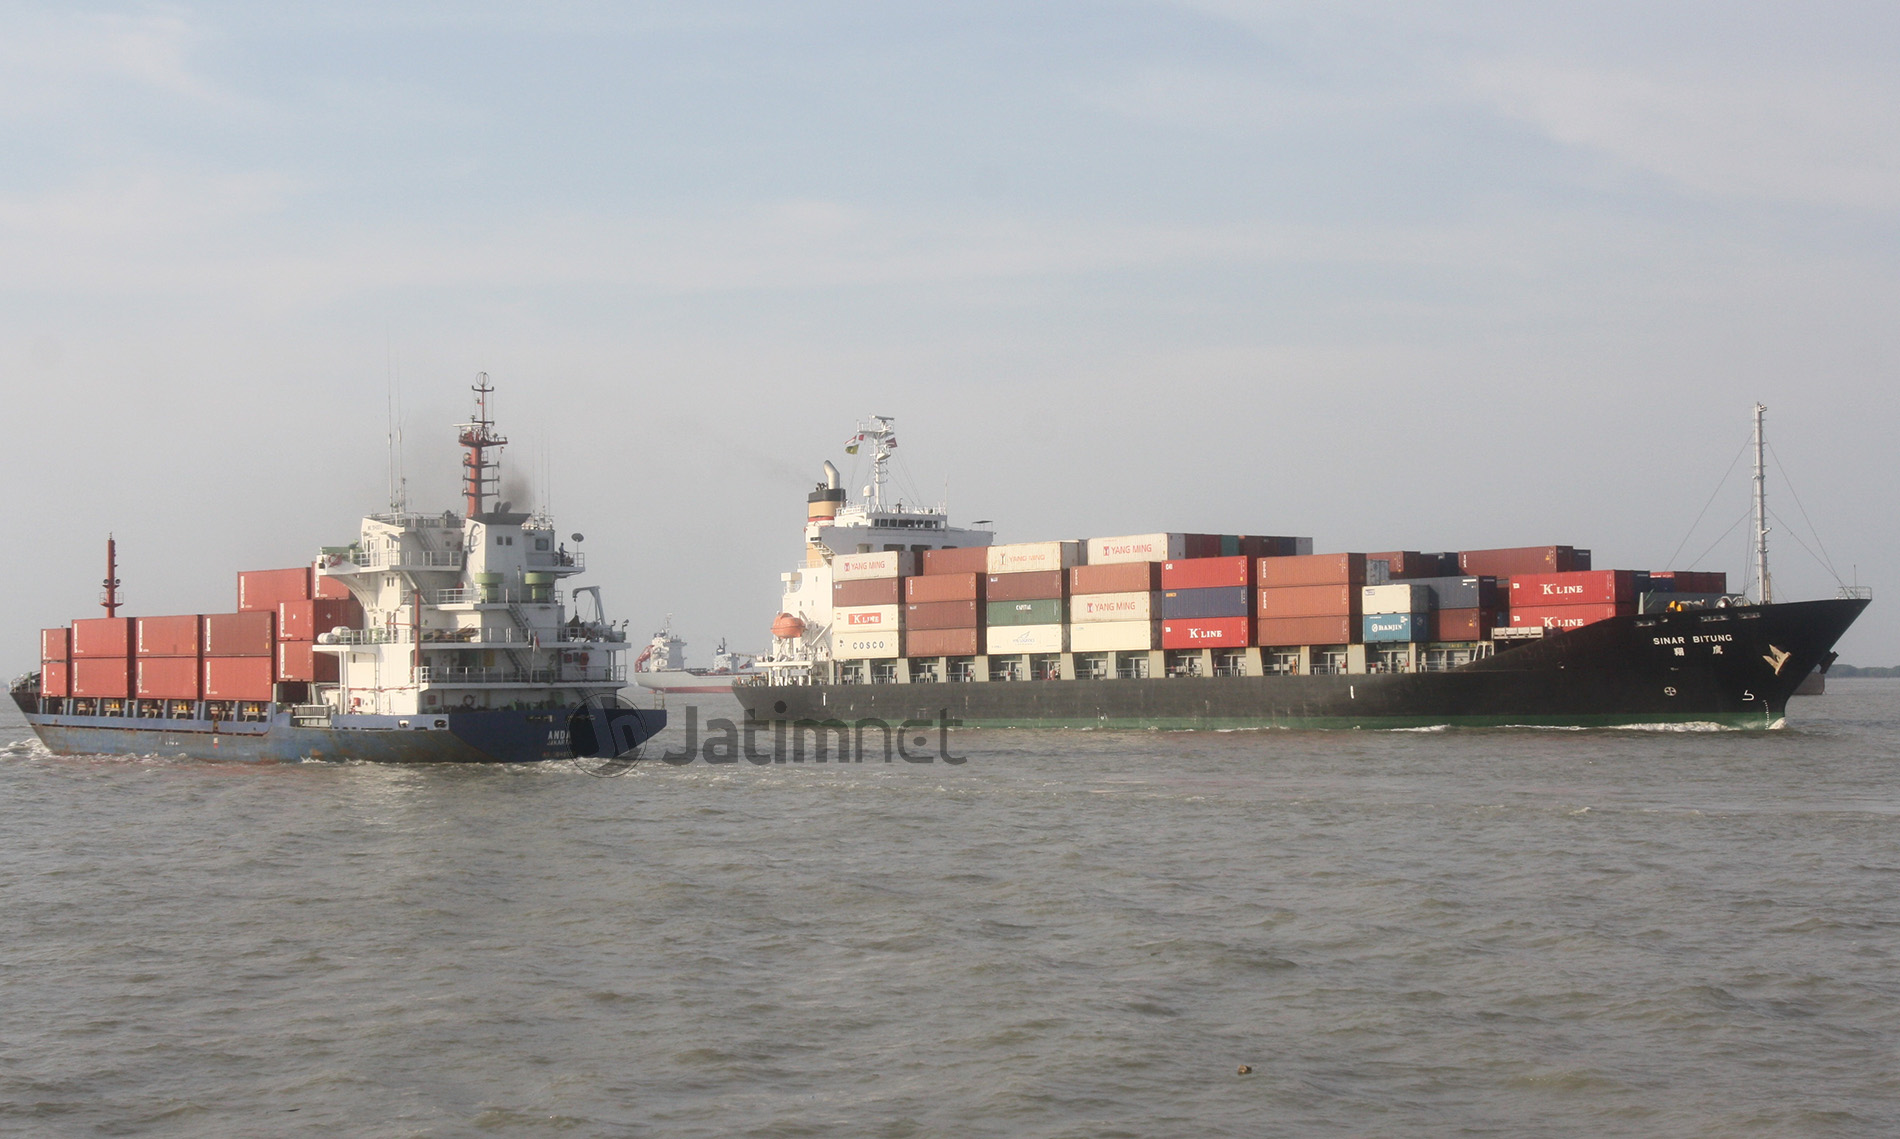 Penipuan Perdagangan Internasional Meningkat, Eksportir Diminta Waspada